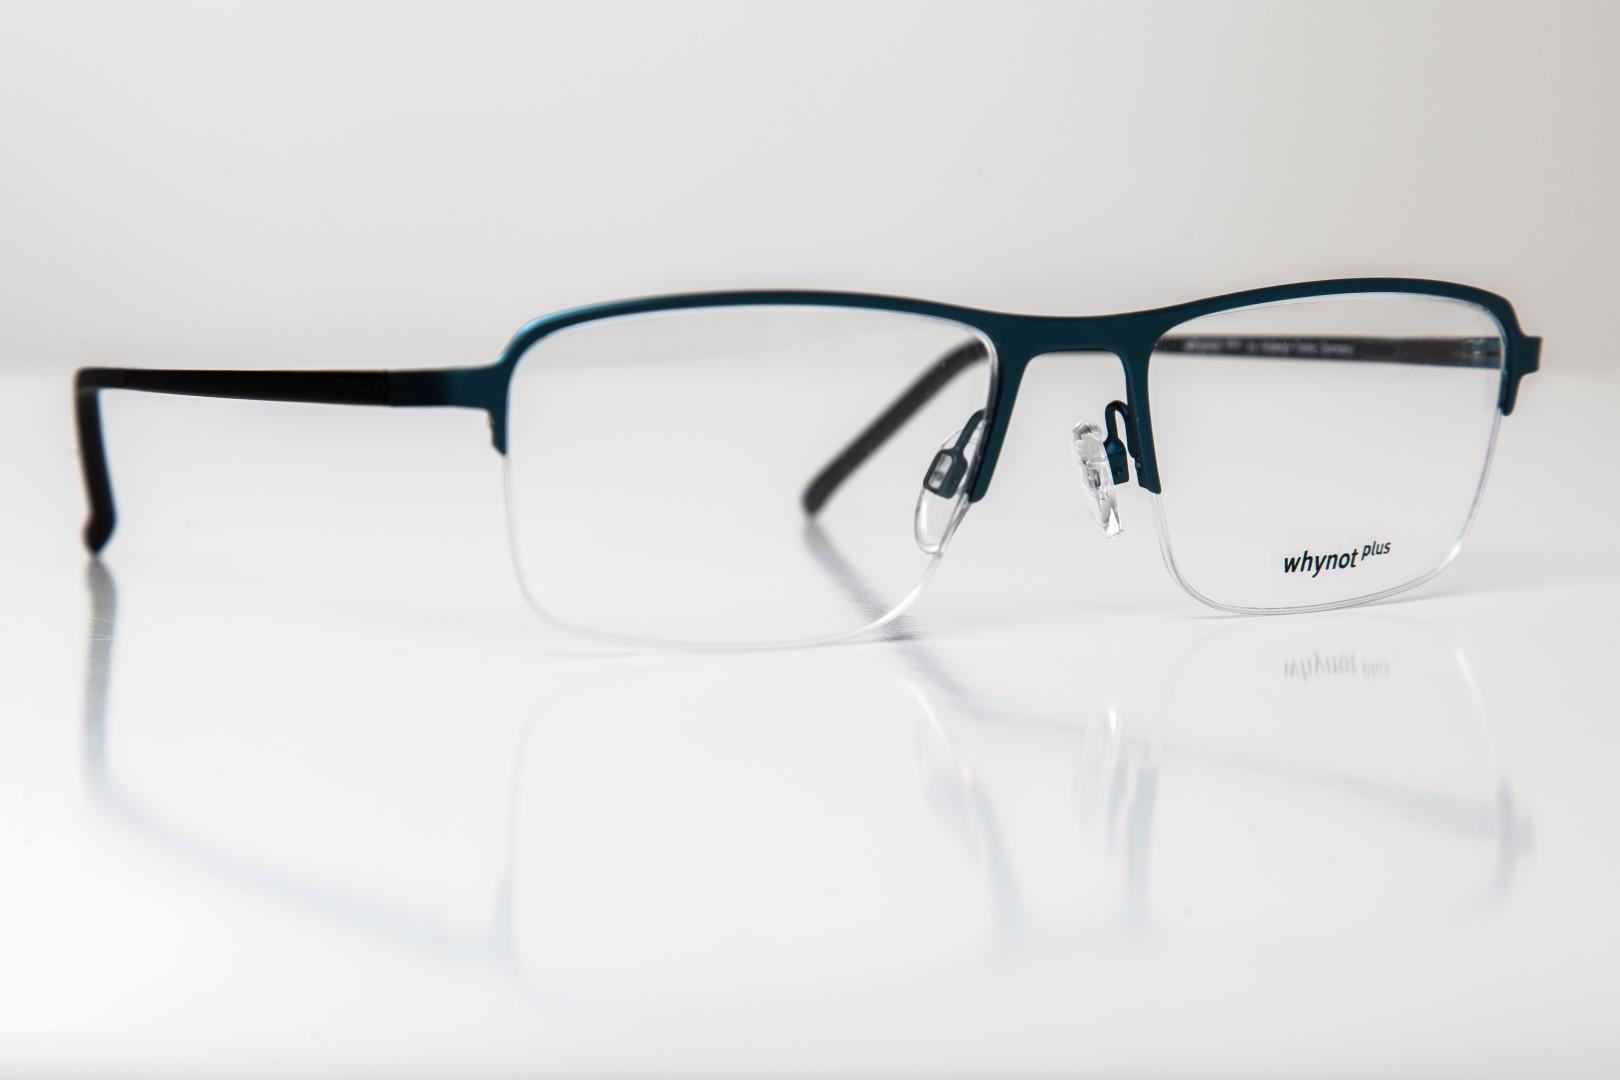 Augenoptiker - Die Meisterbrille in Weimar